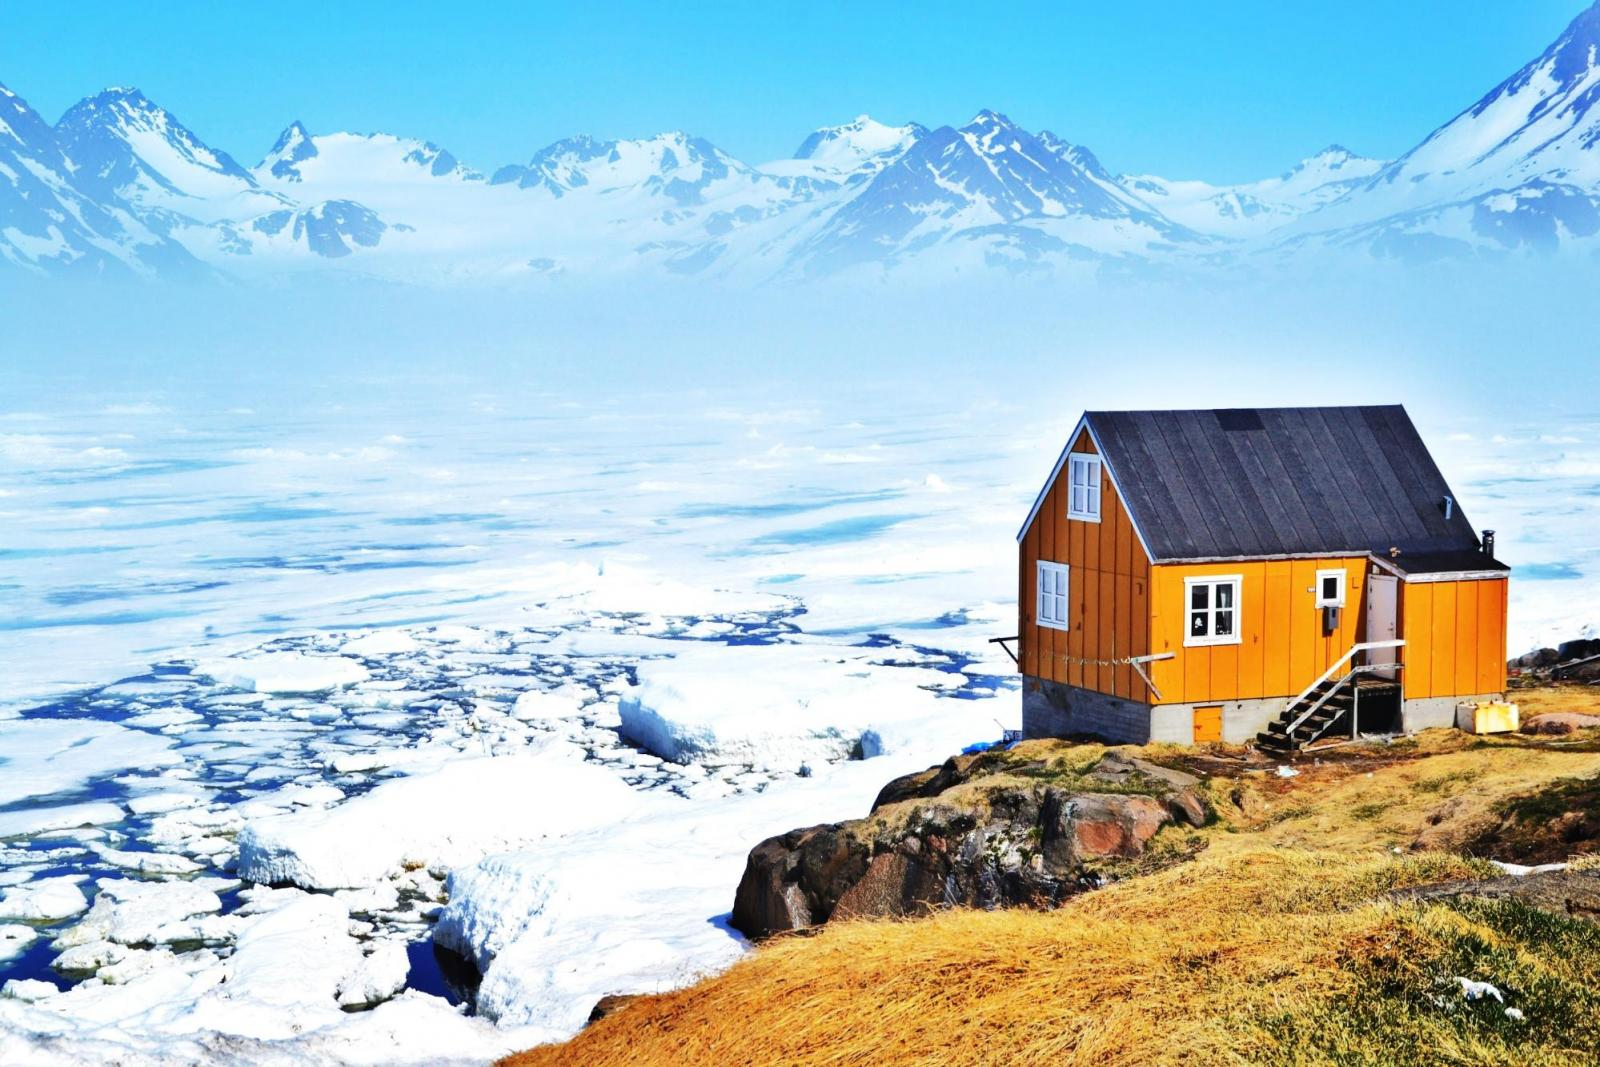 В Гренландии отреагировали на слова о покупке Трампом острова